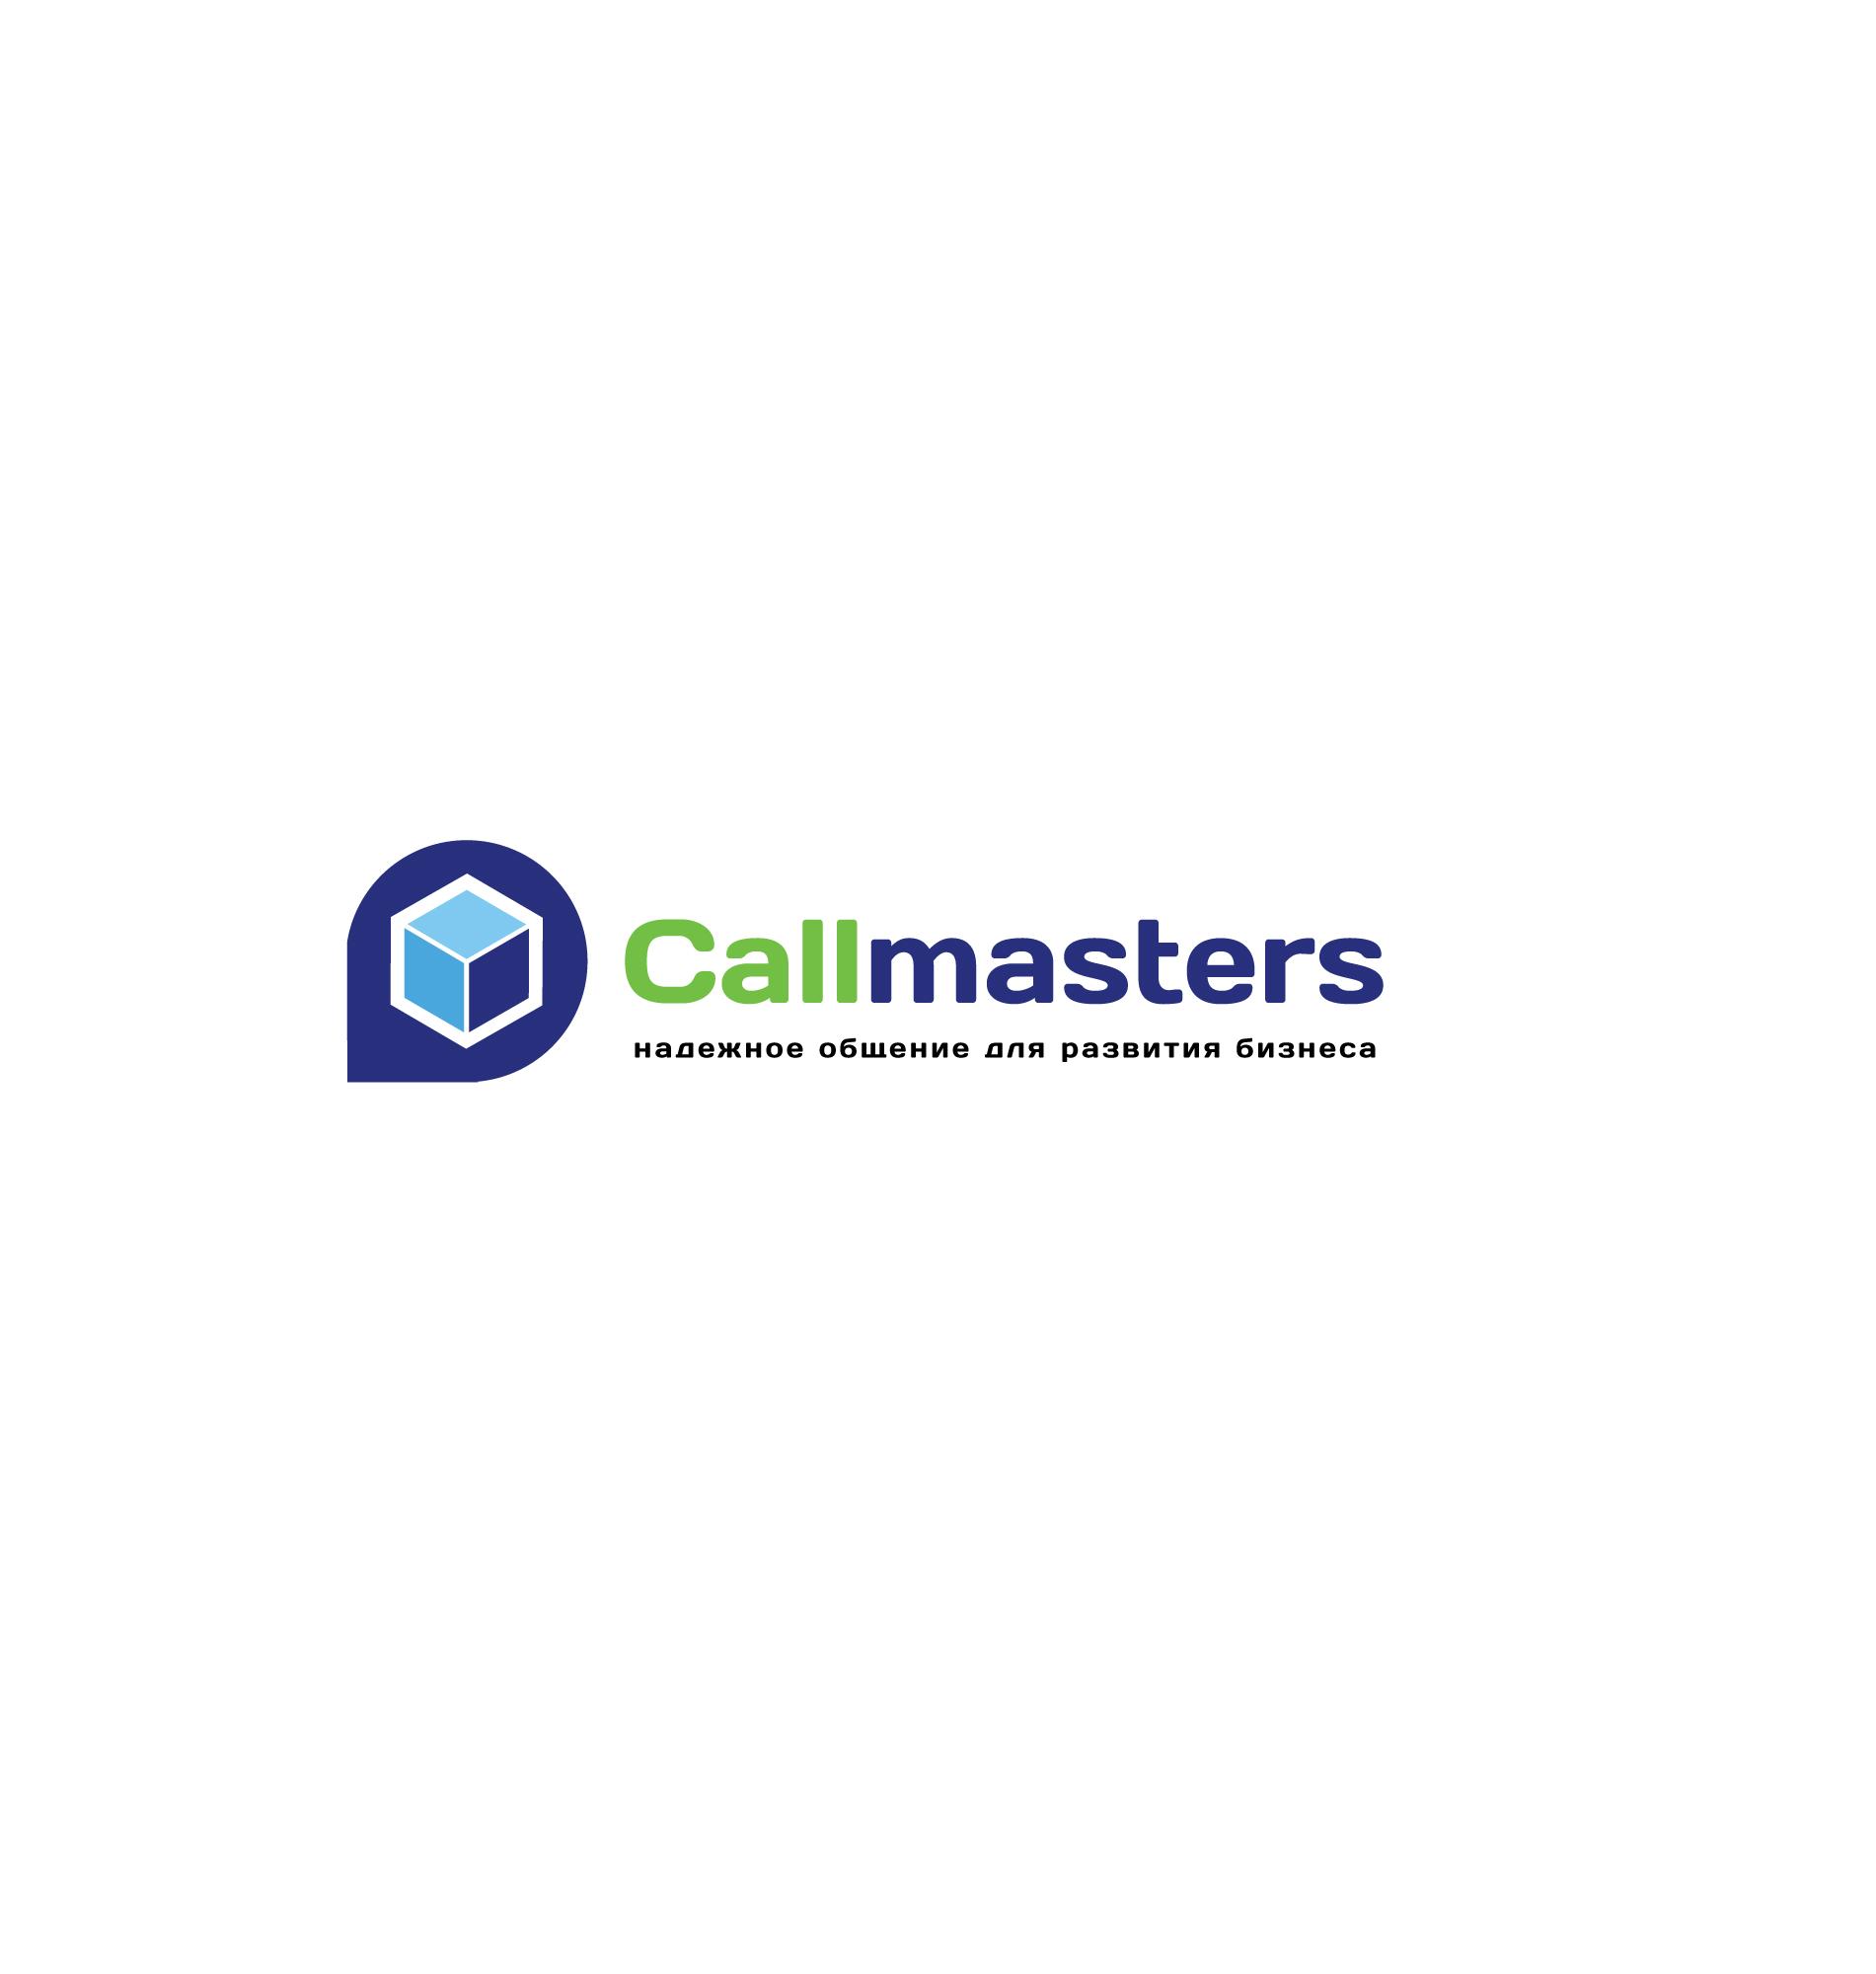 Логотип call-центра Callmasters  фото f_6695b6a278176d37.jpg